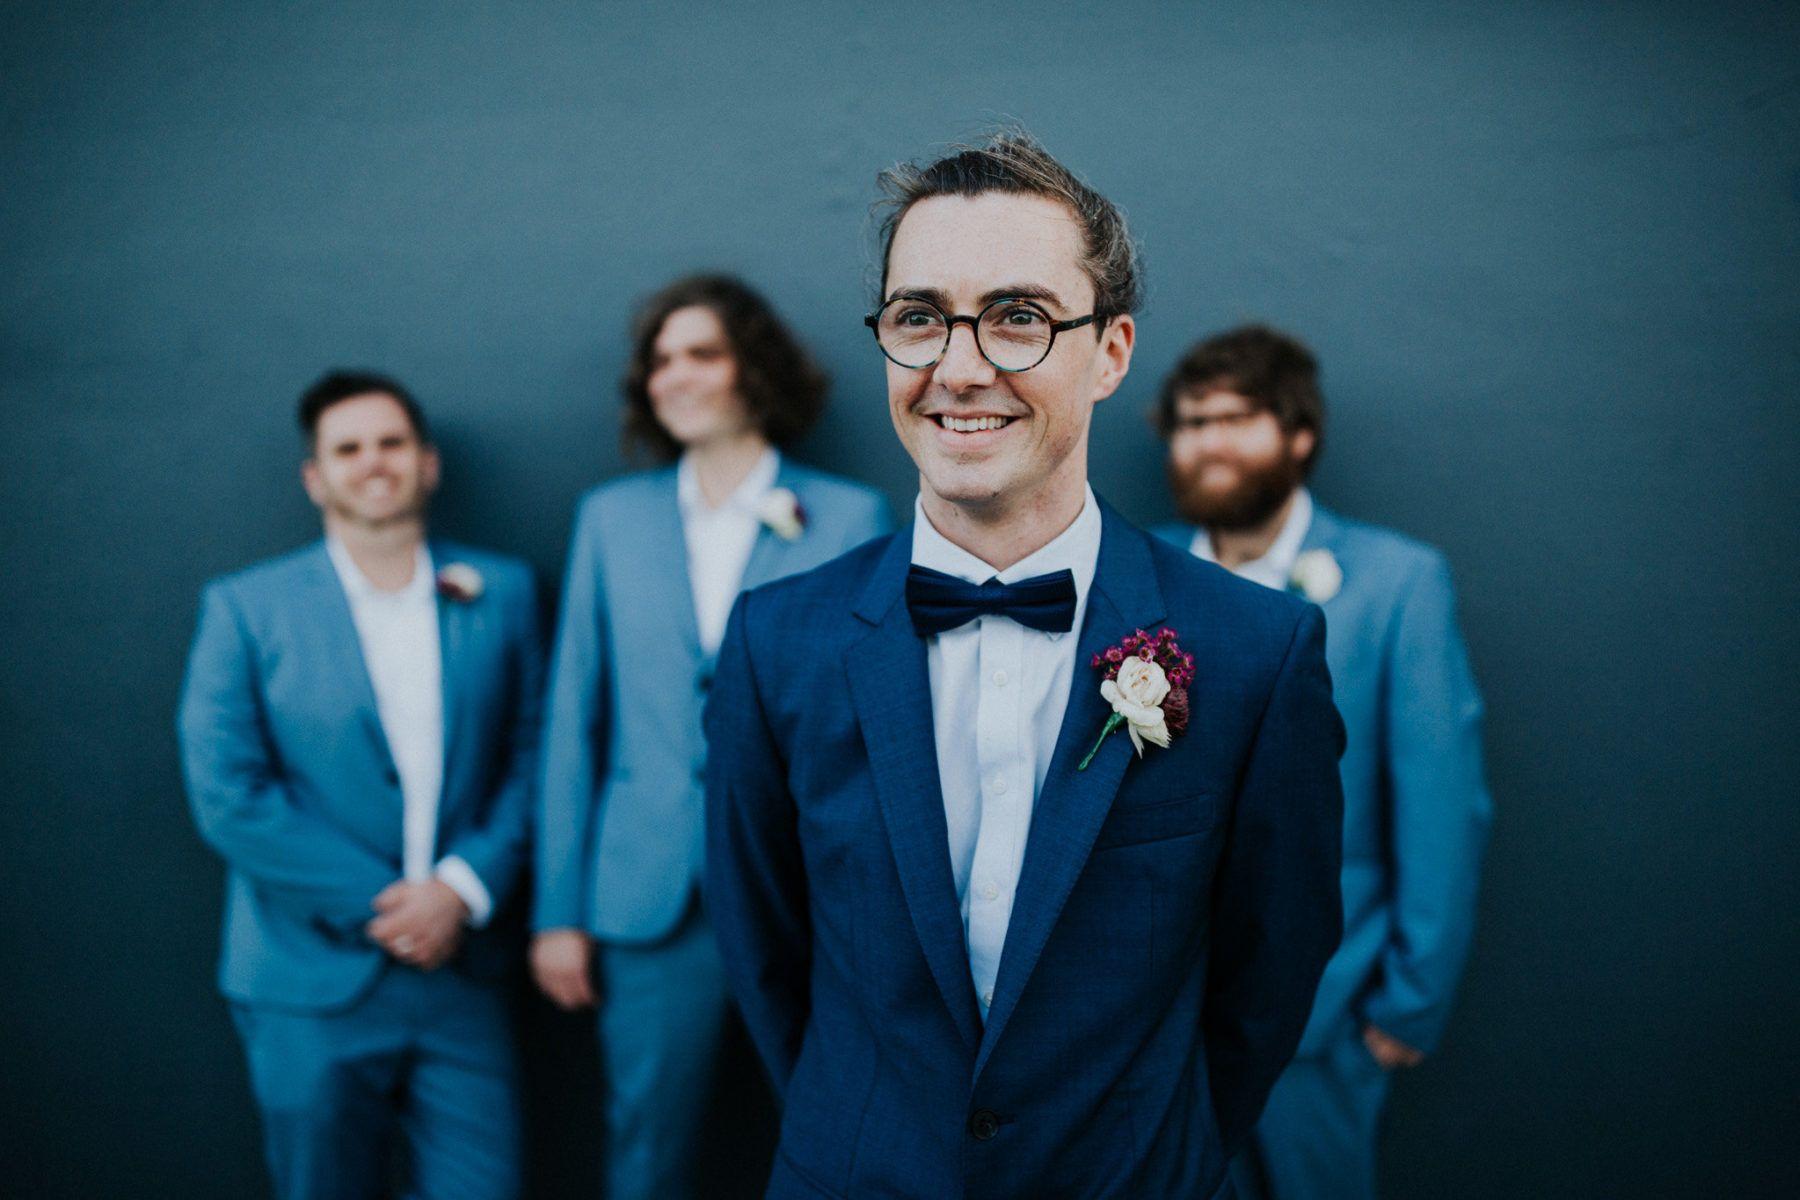 Groom and groomsmen in mixed blue suits | Groom. | Pinterest